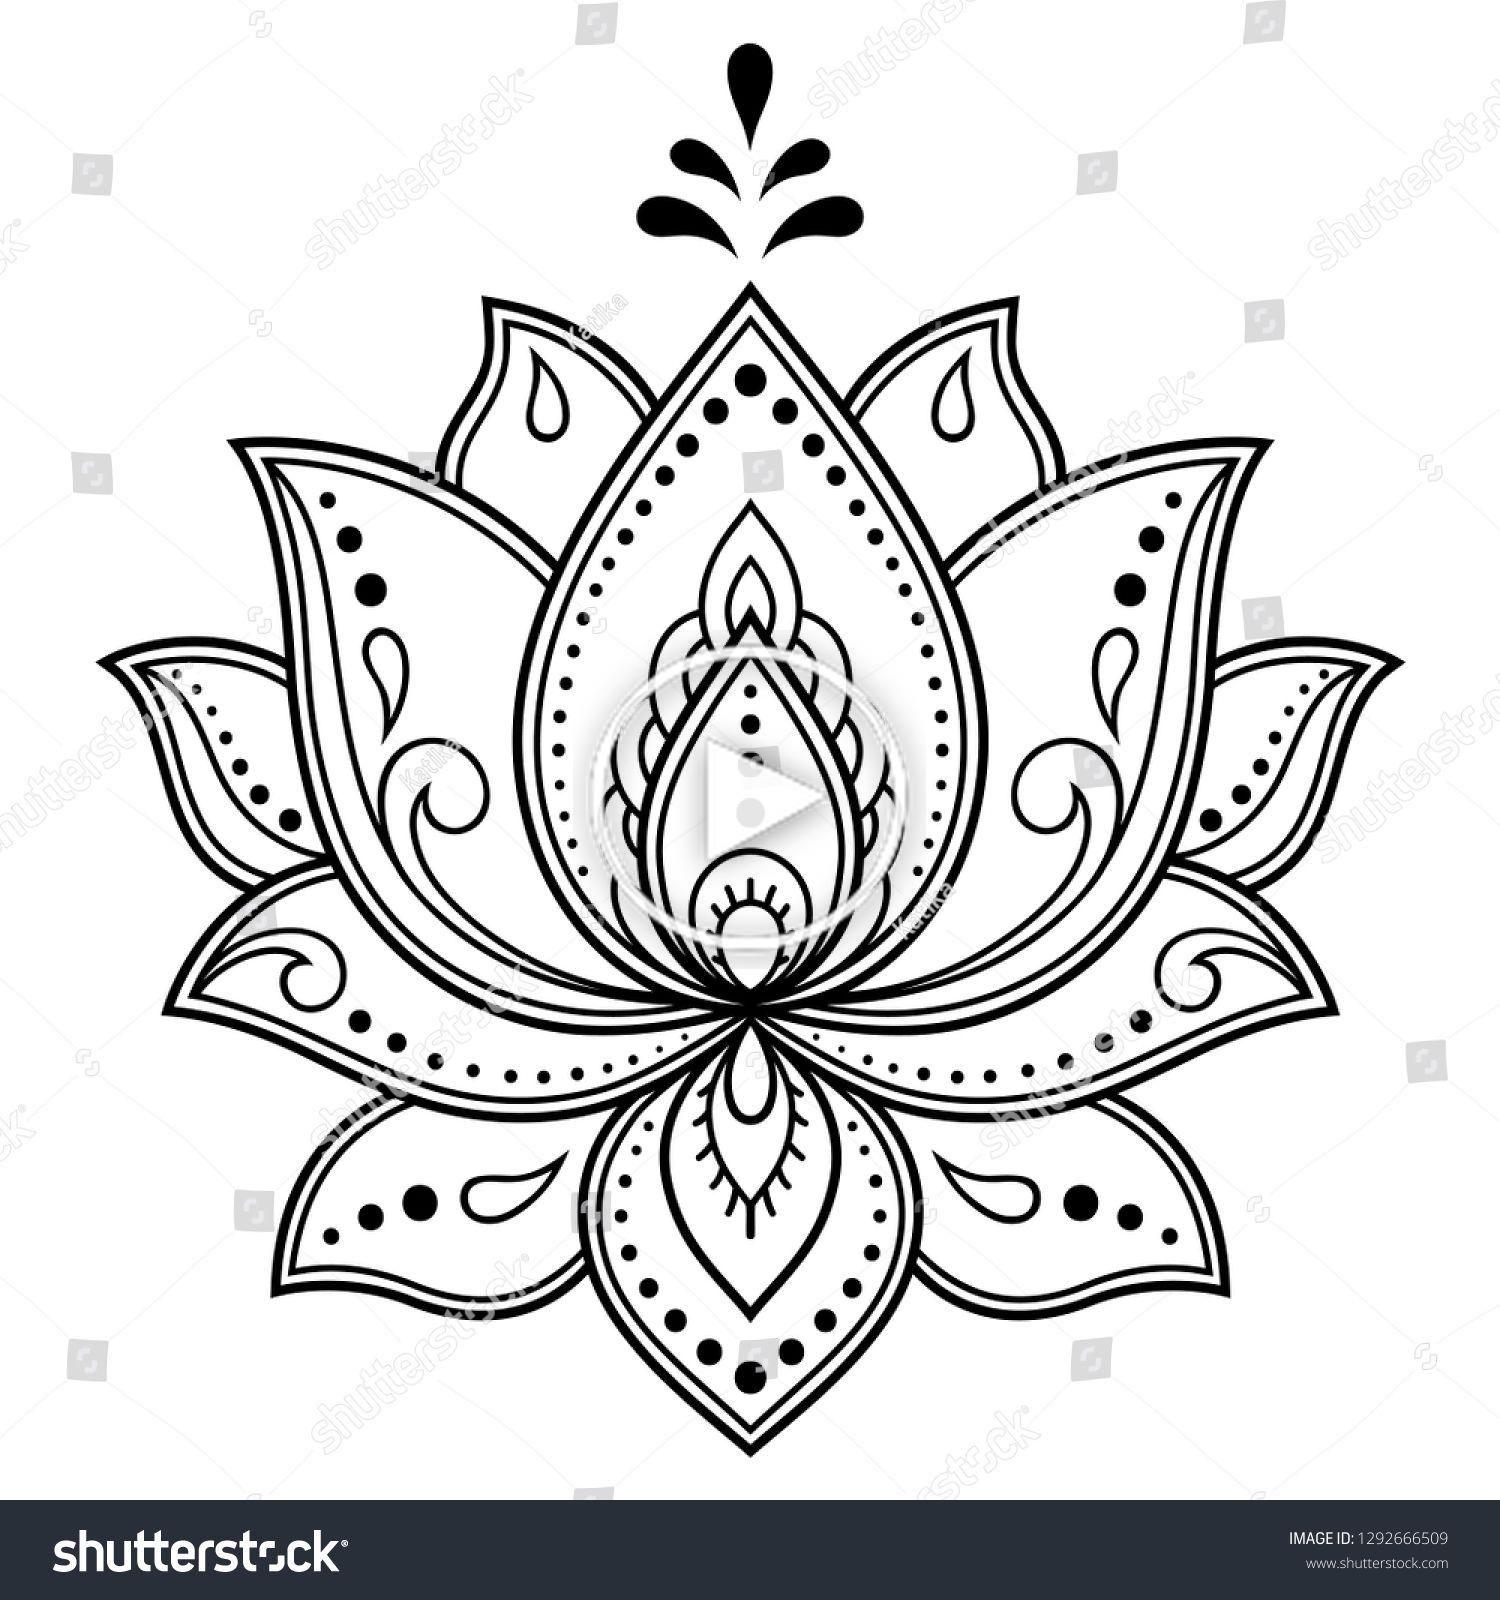 Vector De Stock Libre De Regalias Sobre Mehndi Lotus Flower Pattern Henna Drawing12926 Mandalas Faciles De Dibujar Plantillas De Mandalas Flor De Loto Dibujo